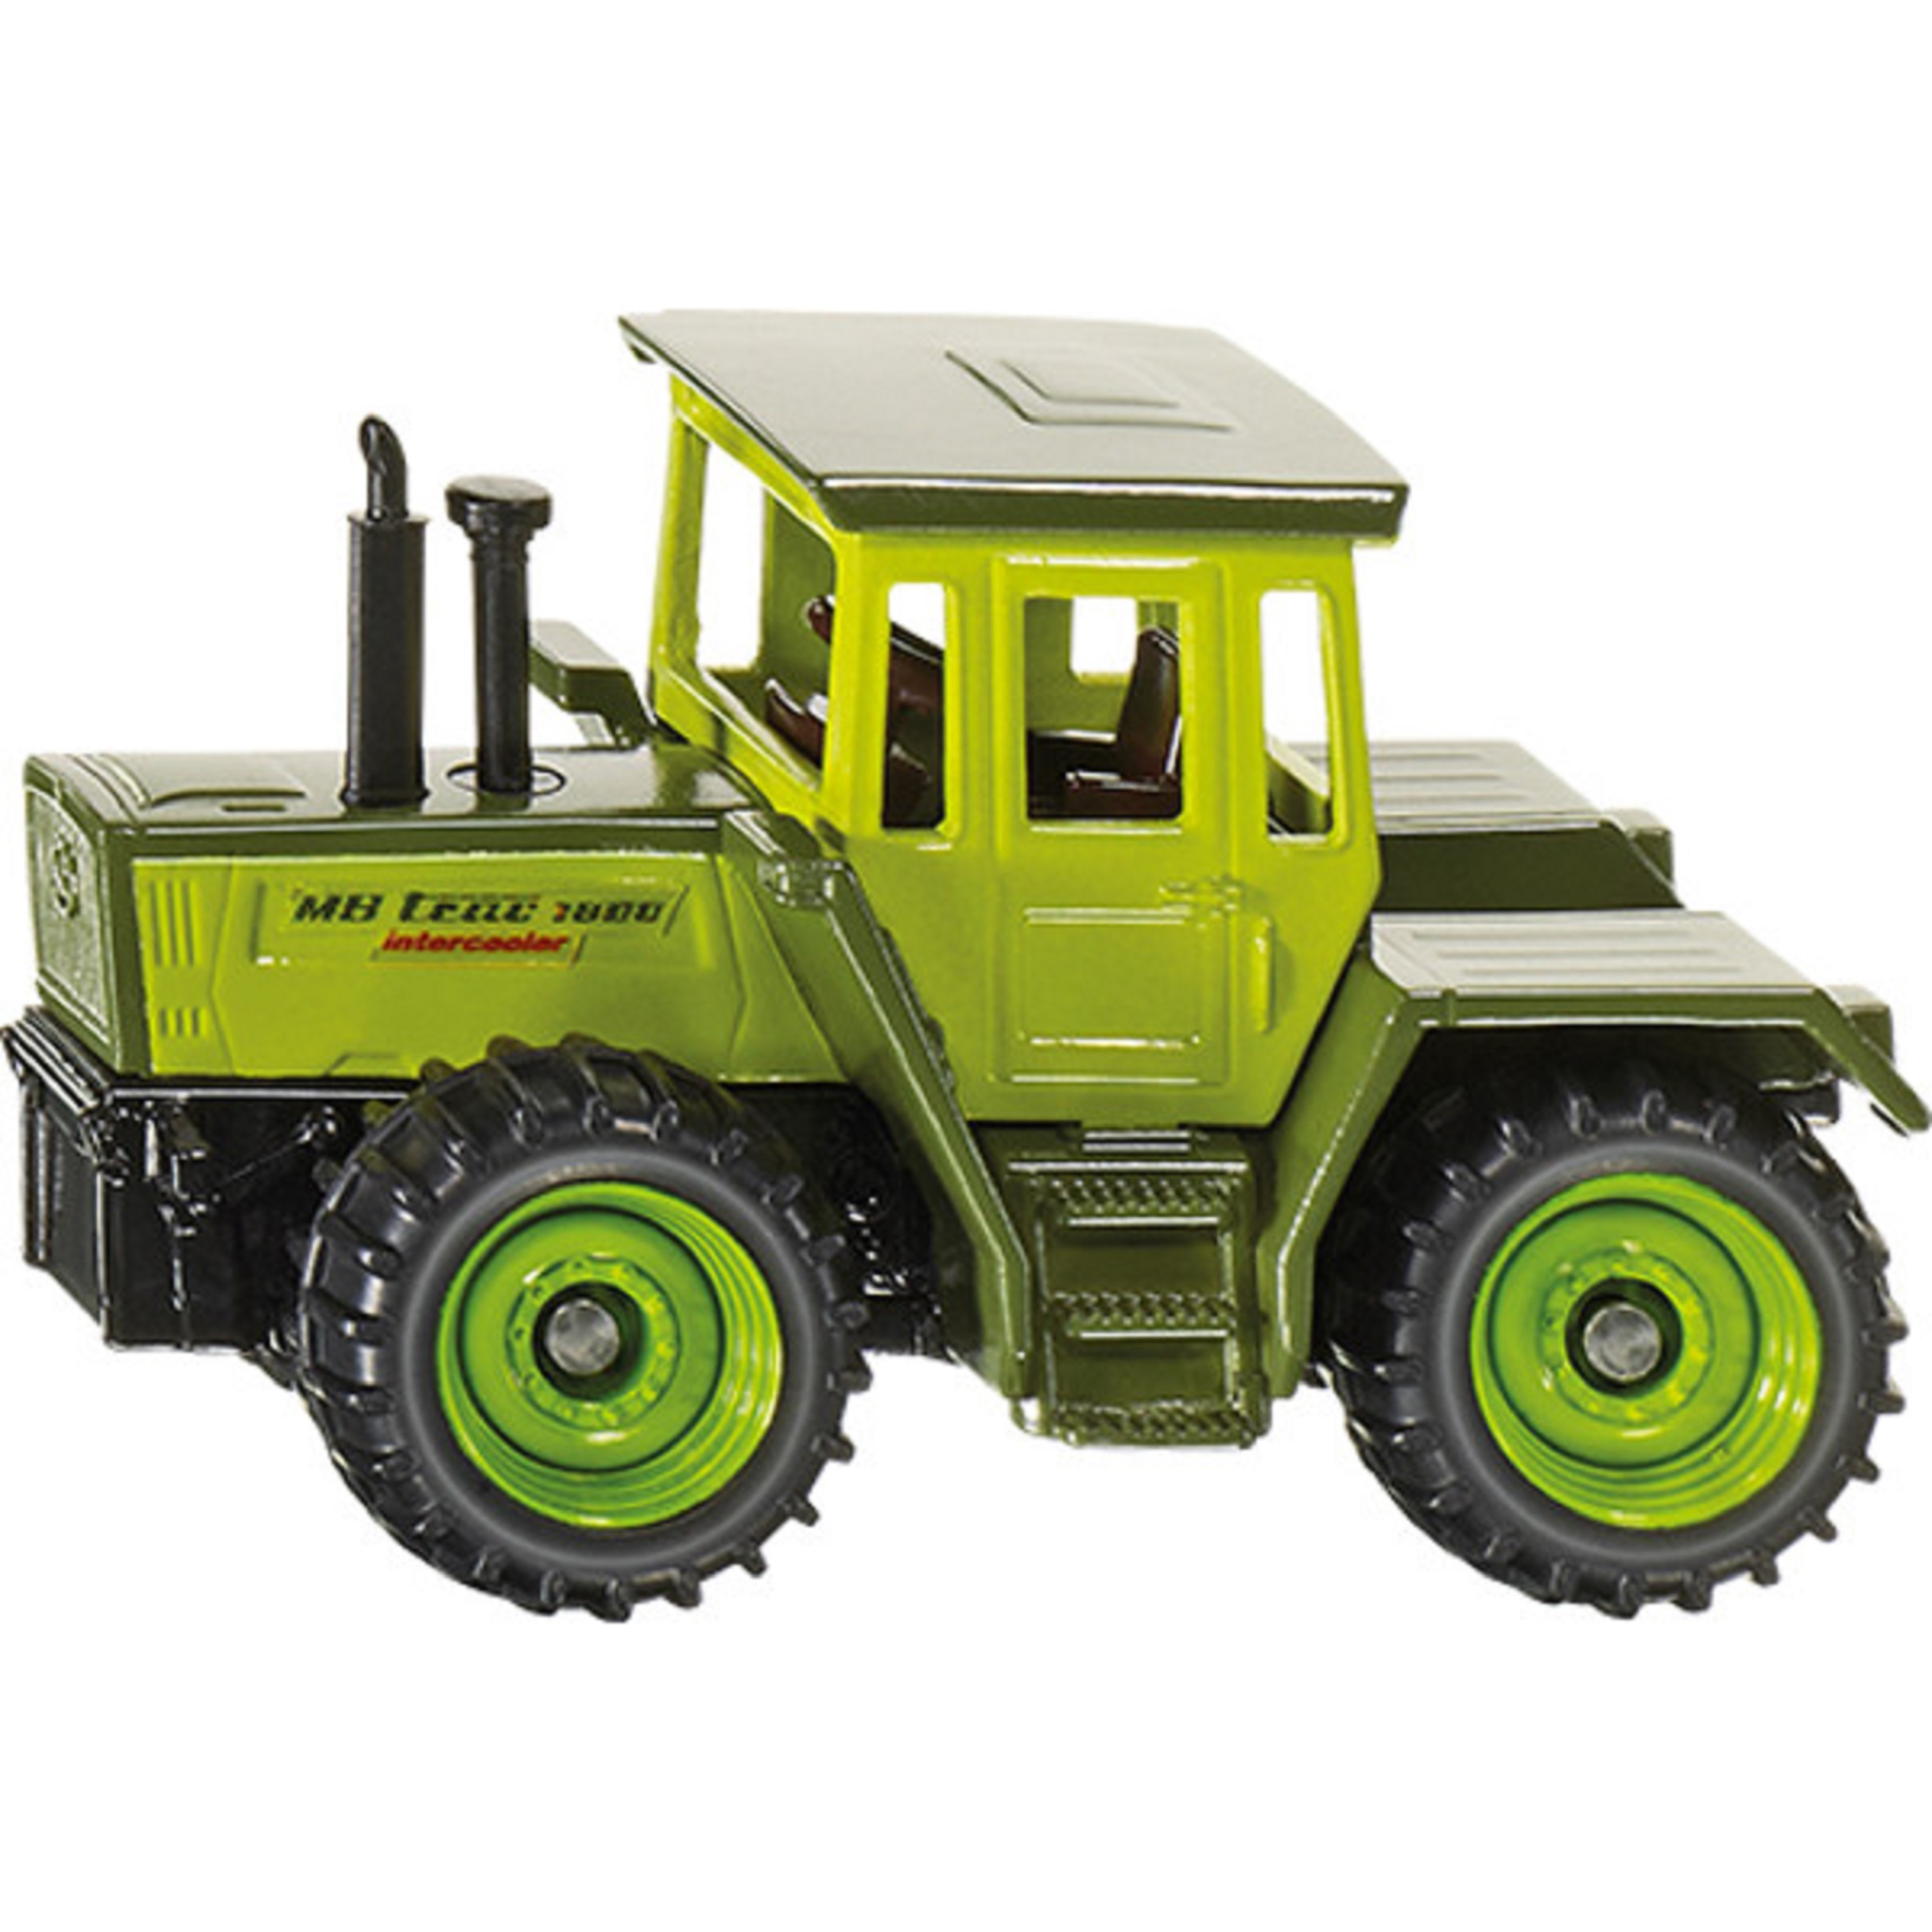 Jucarie - Tractor Buggy M8 | Siku